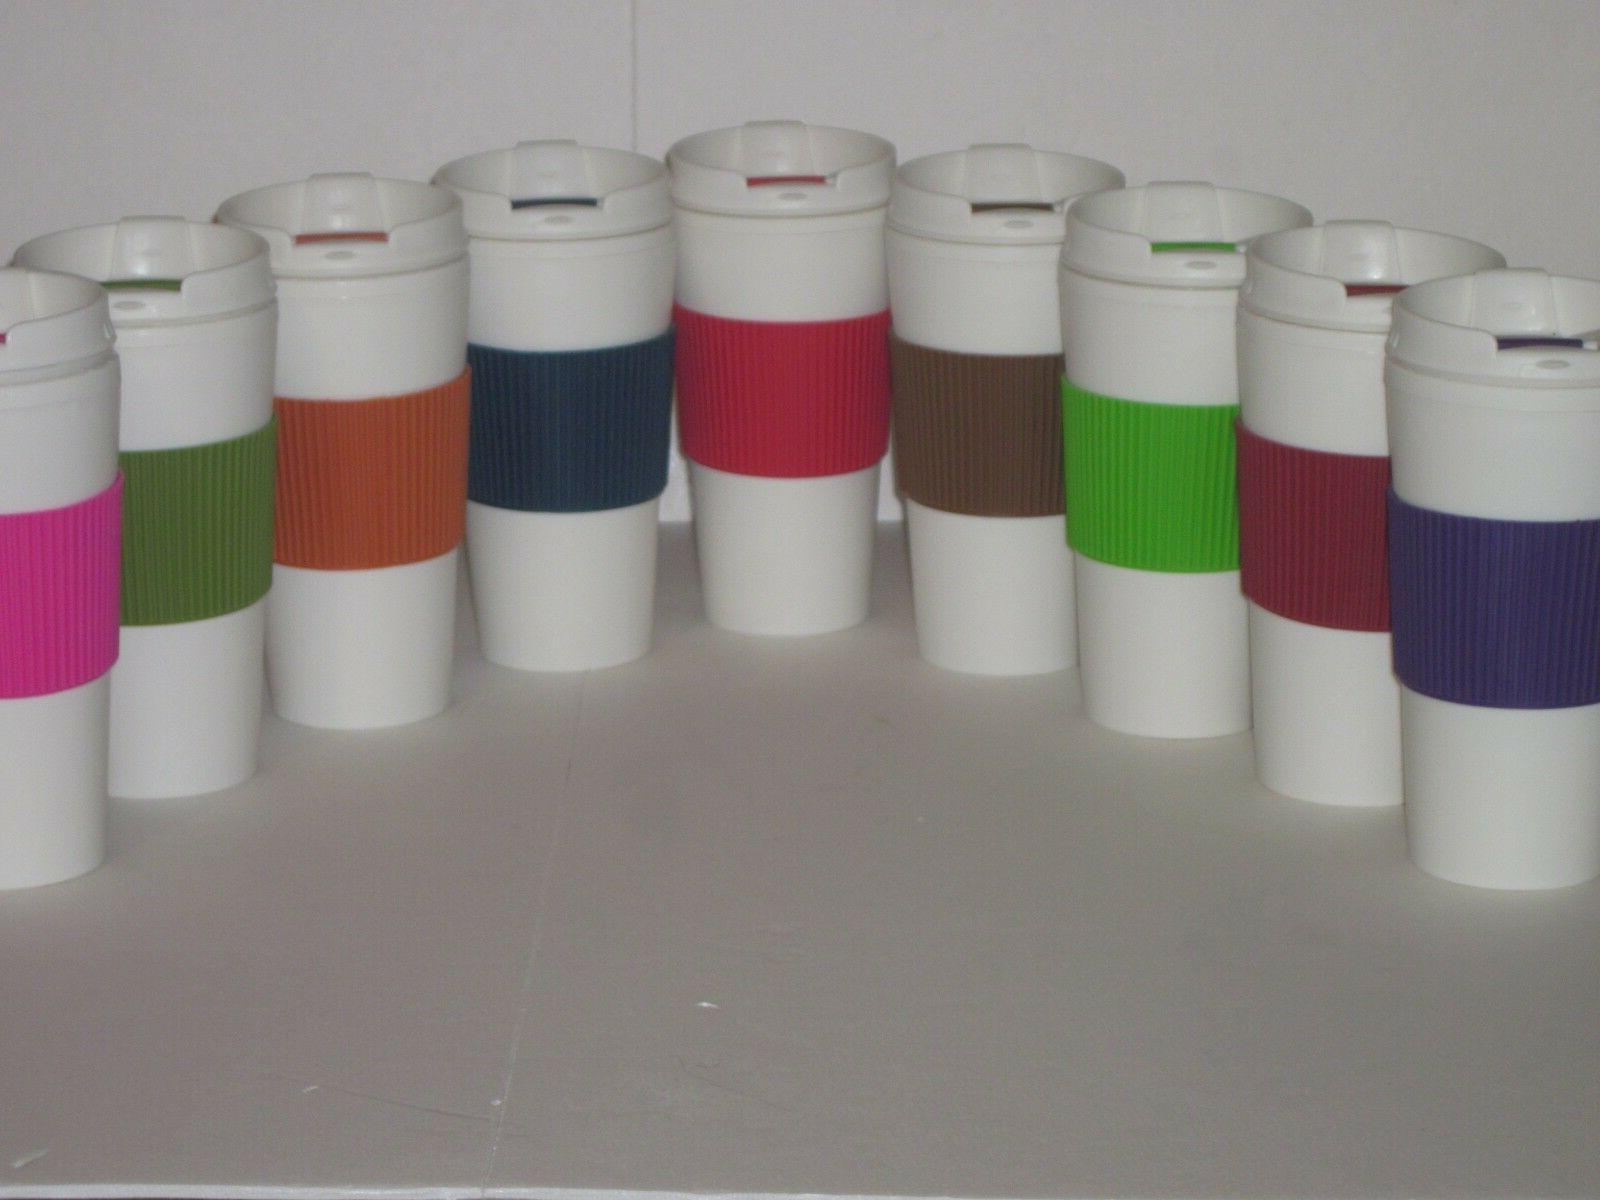 Thermal 16oz Travel Mug - Car, Go, Cup, Mug, Thermos,